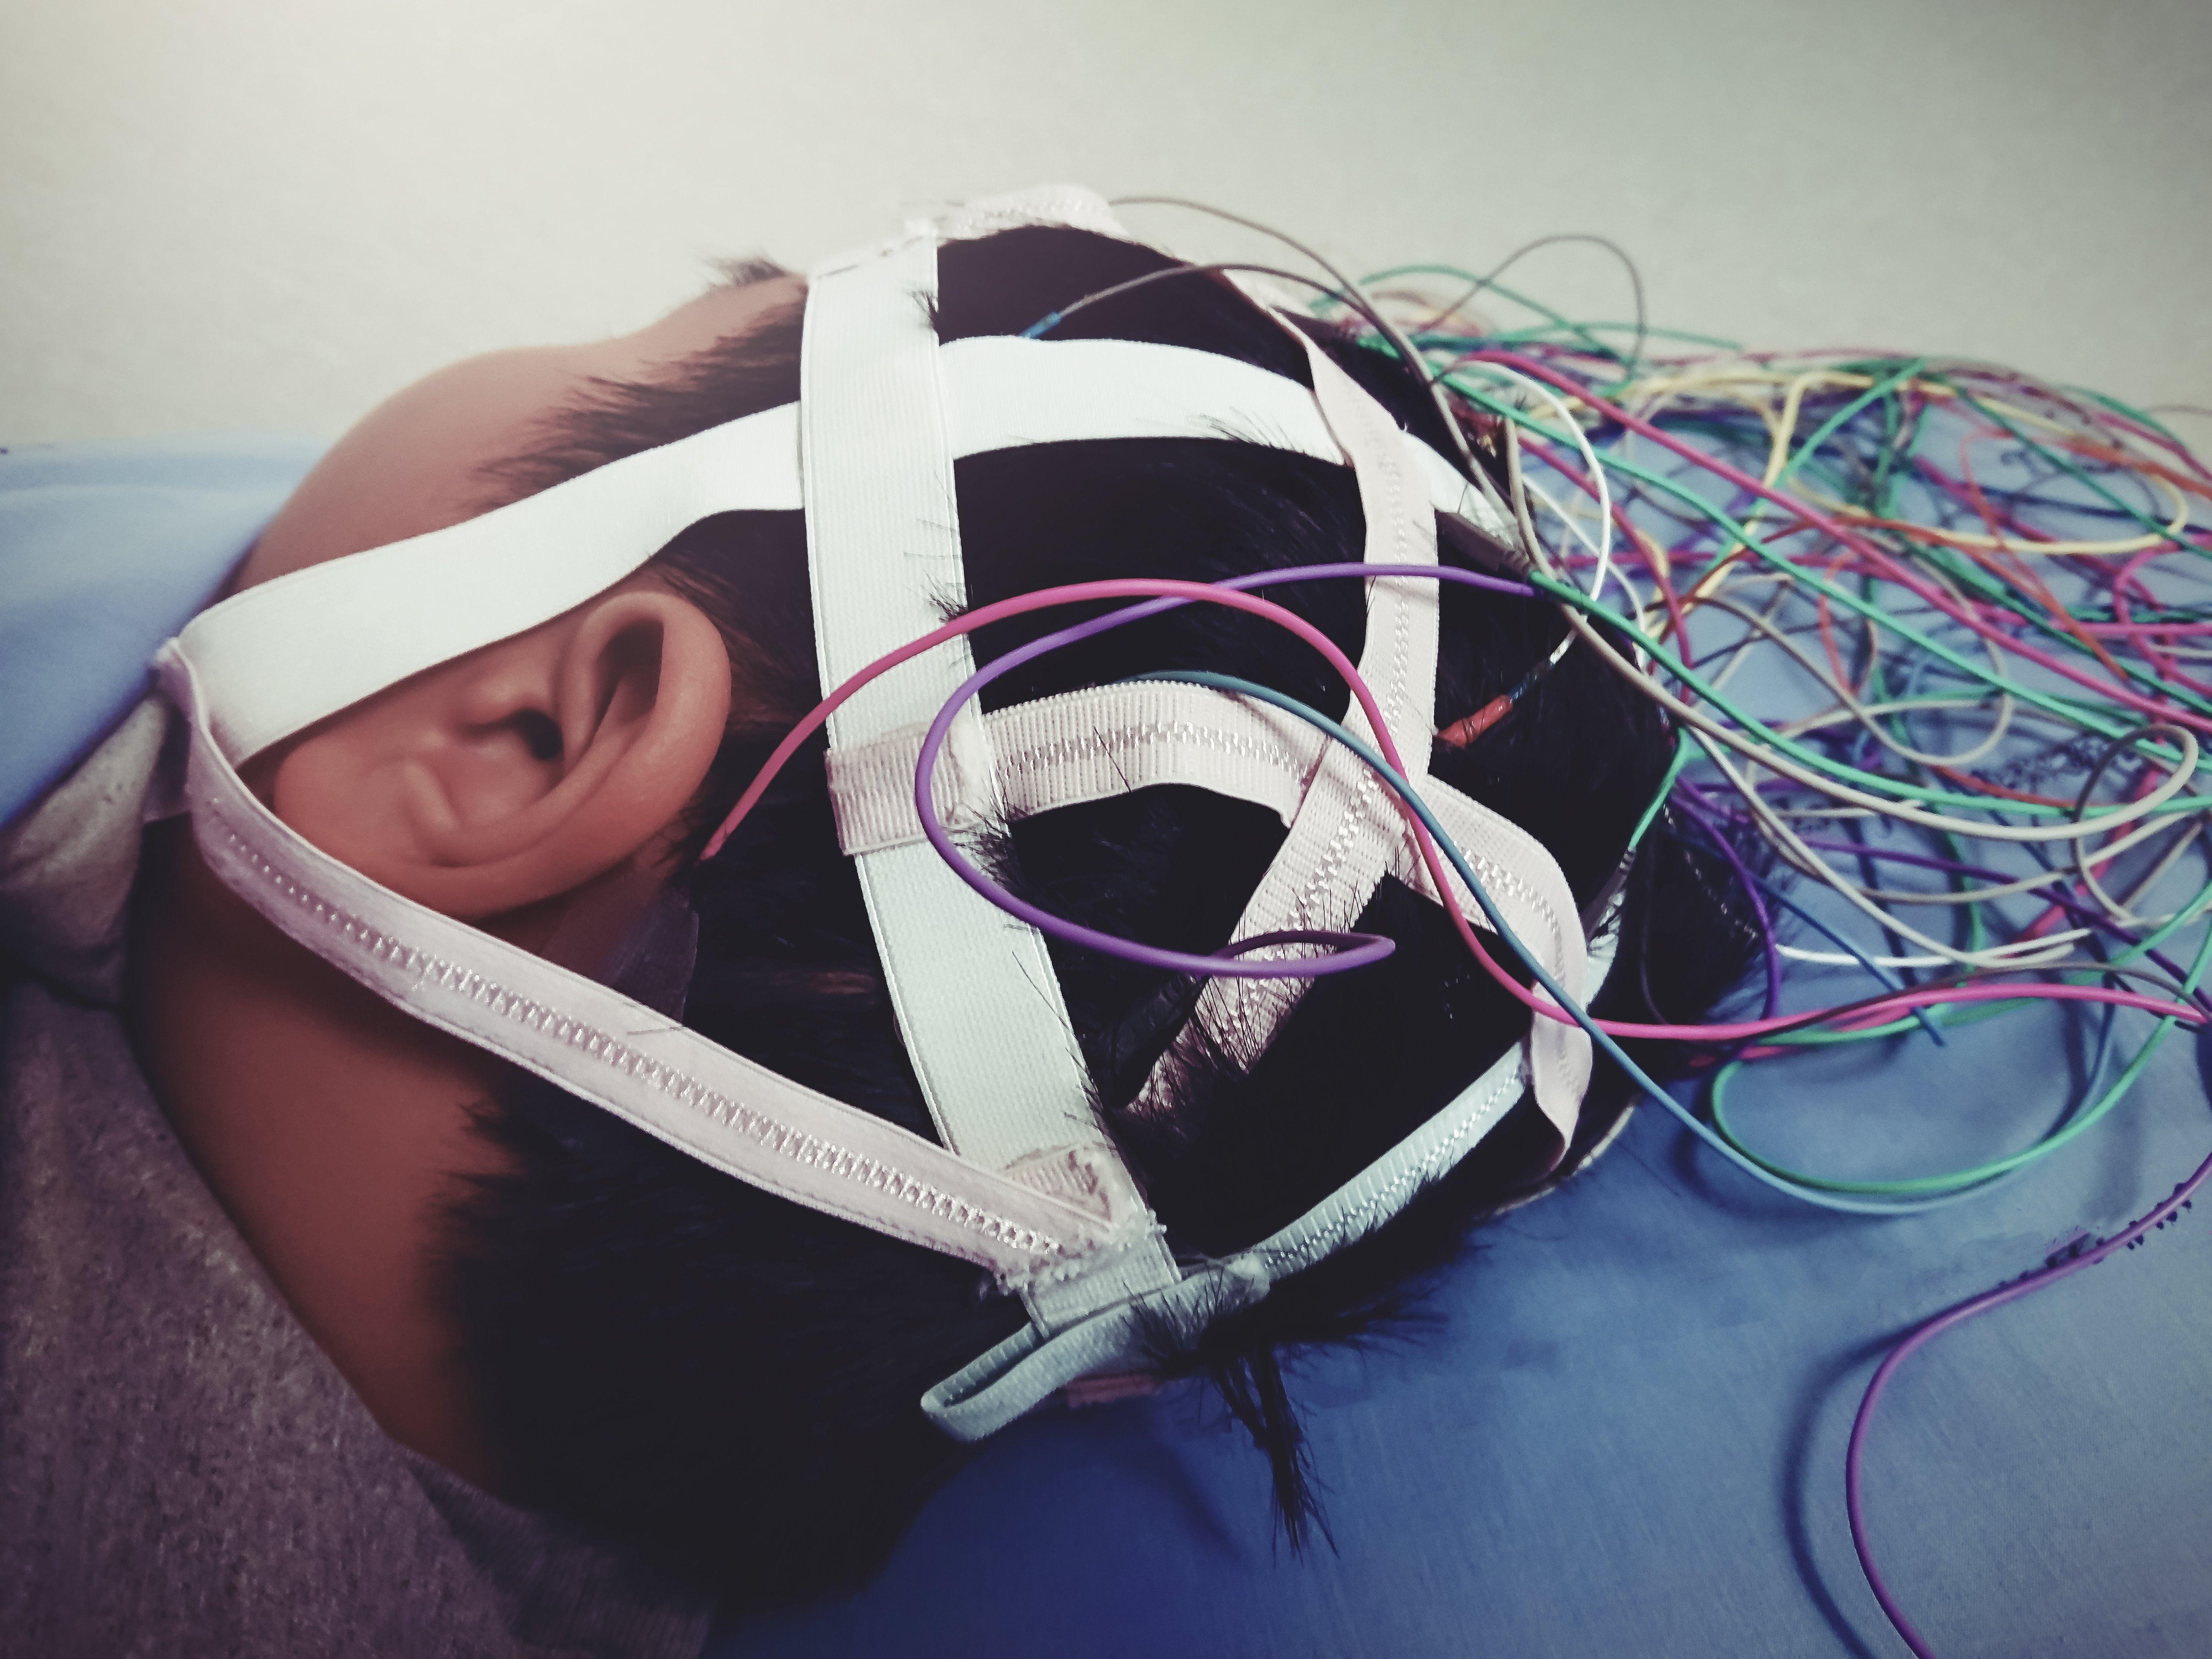 Ped Neuro Pic 3